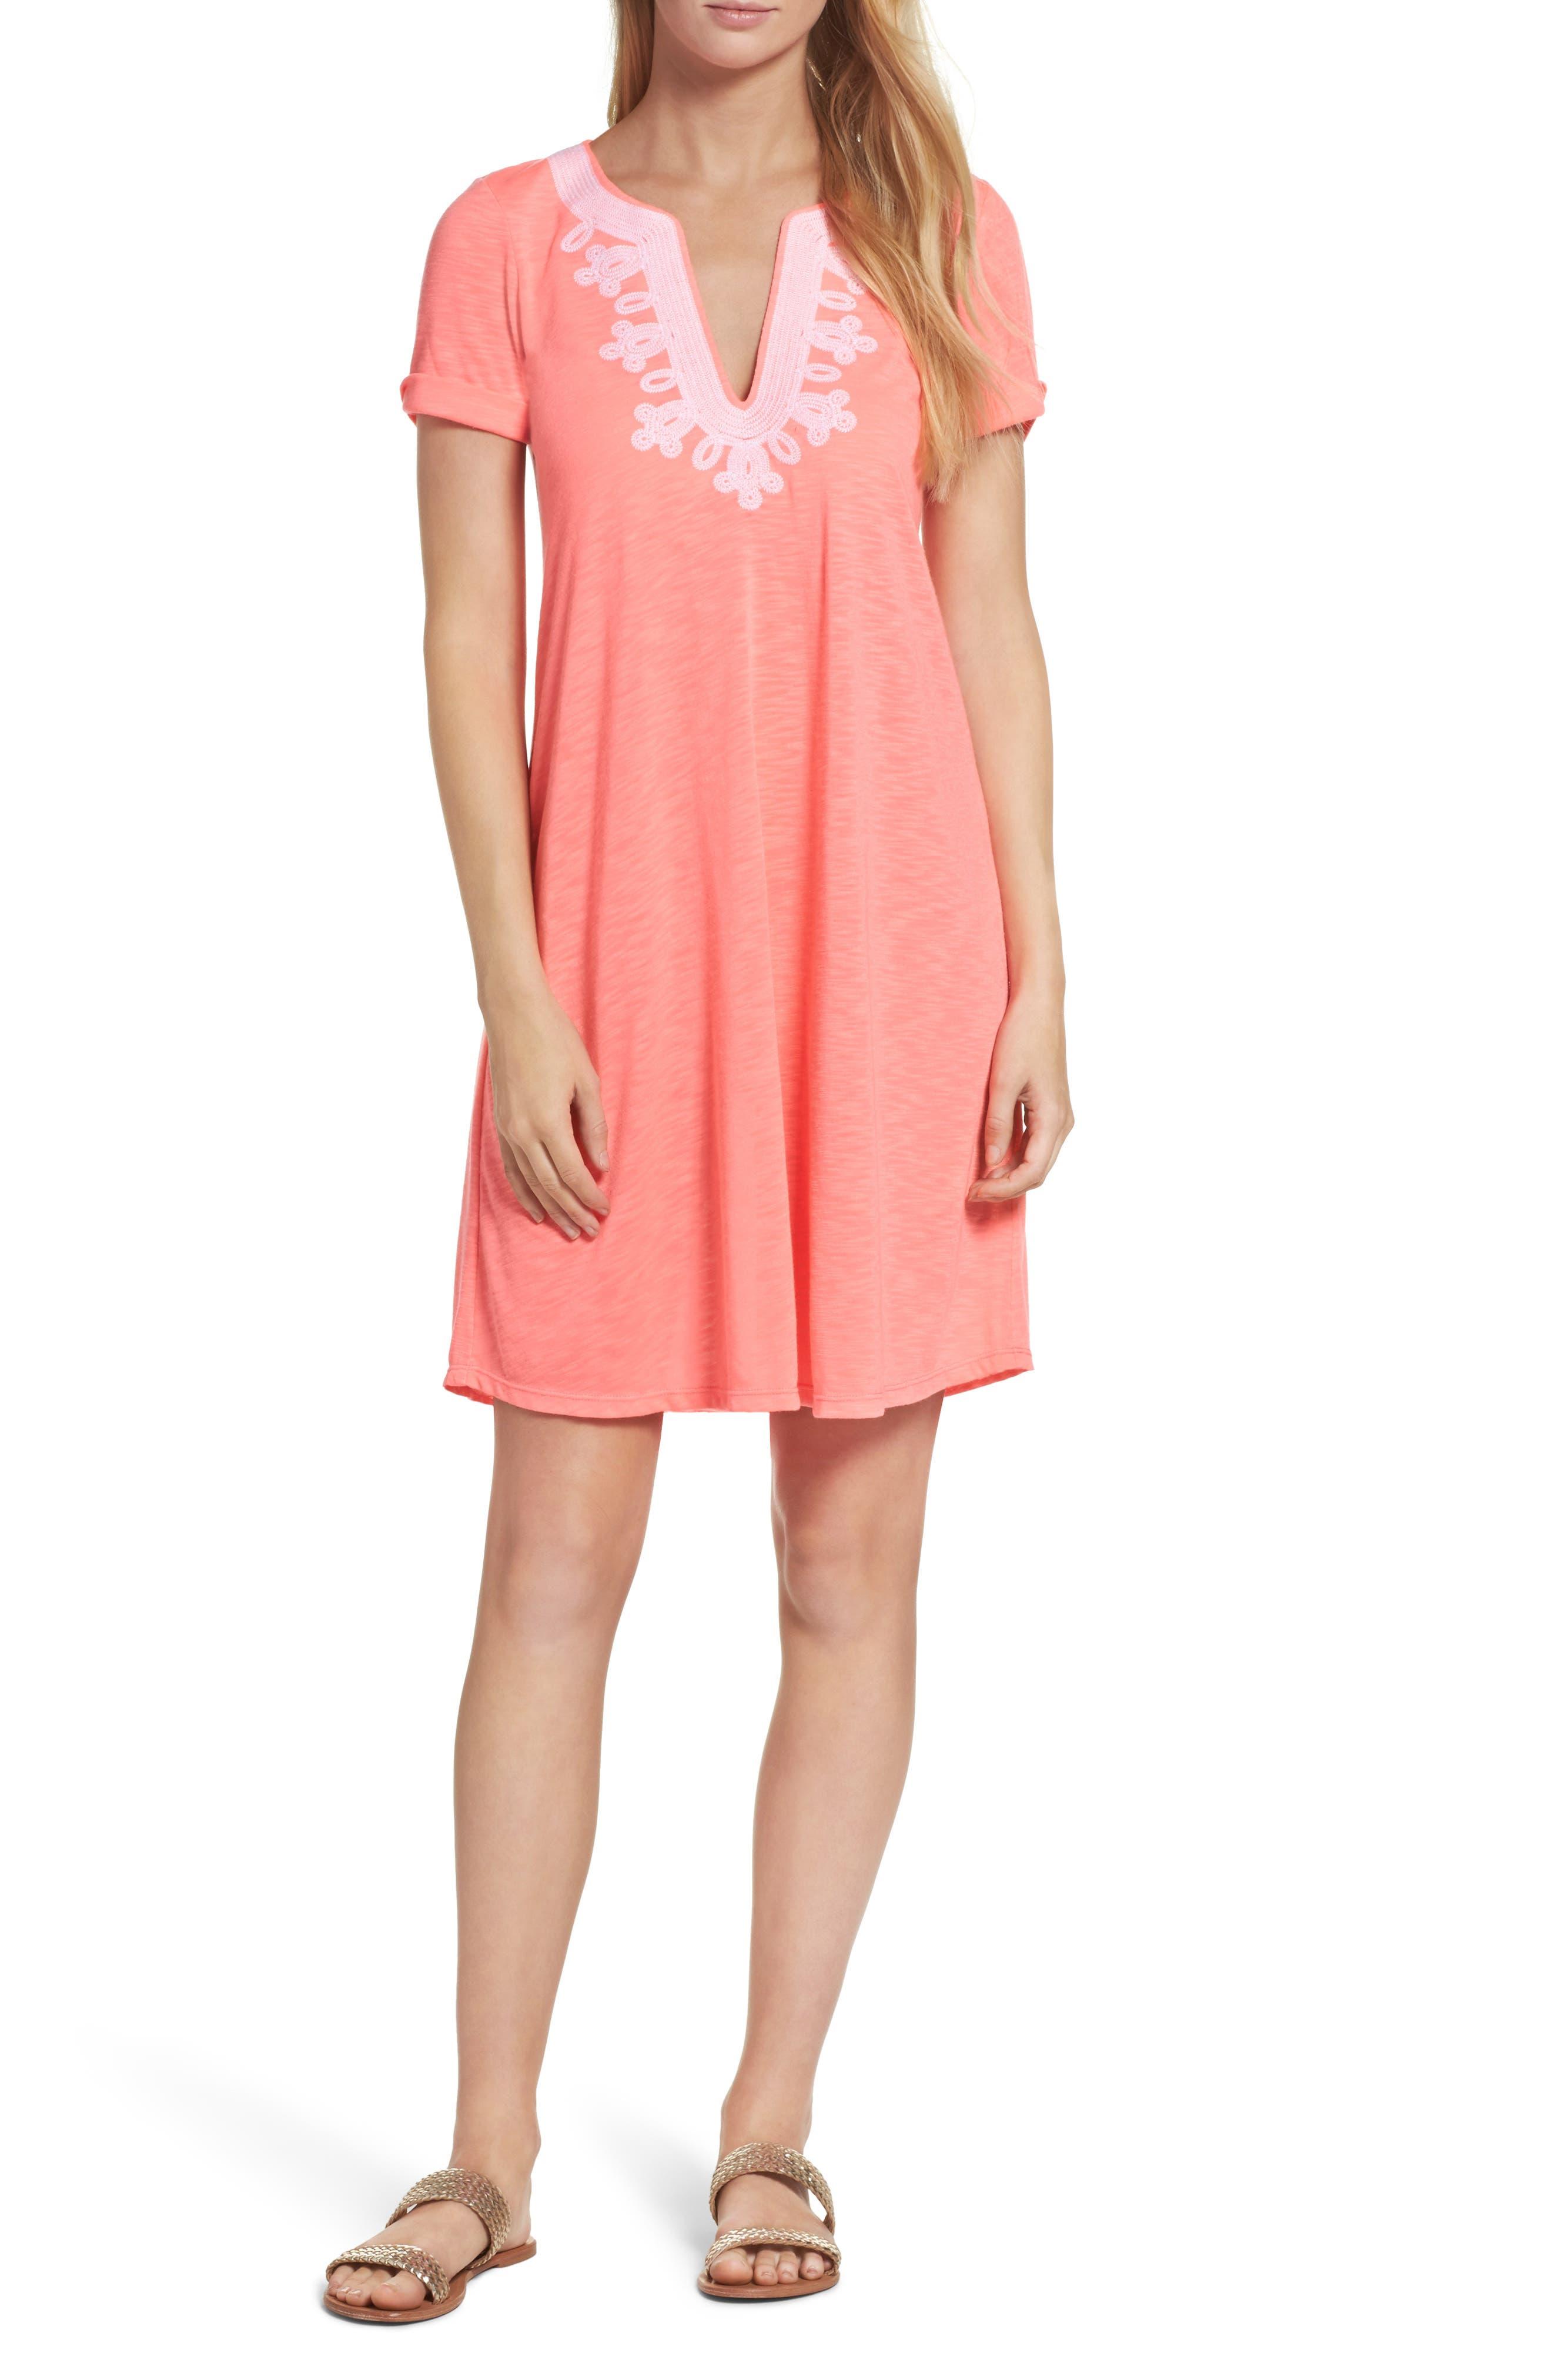 Lilly Pulitzer® Maisy T-Shirt Dress